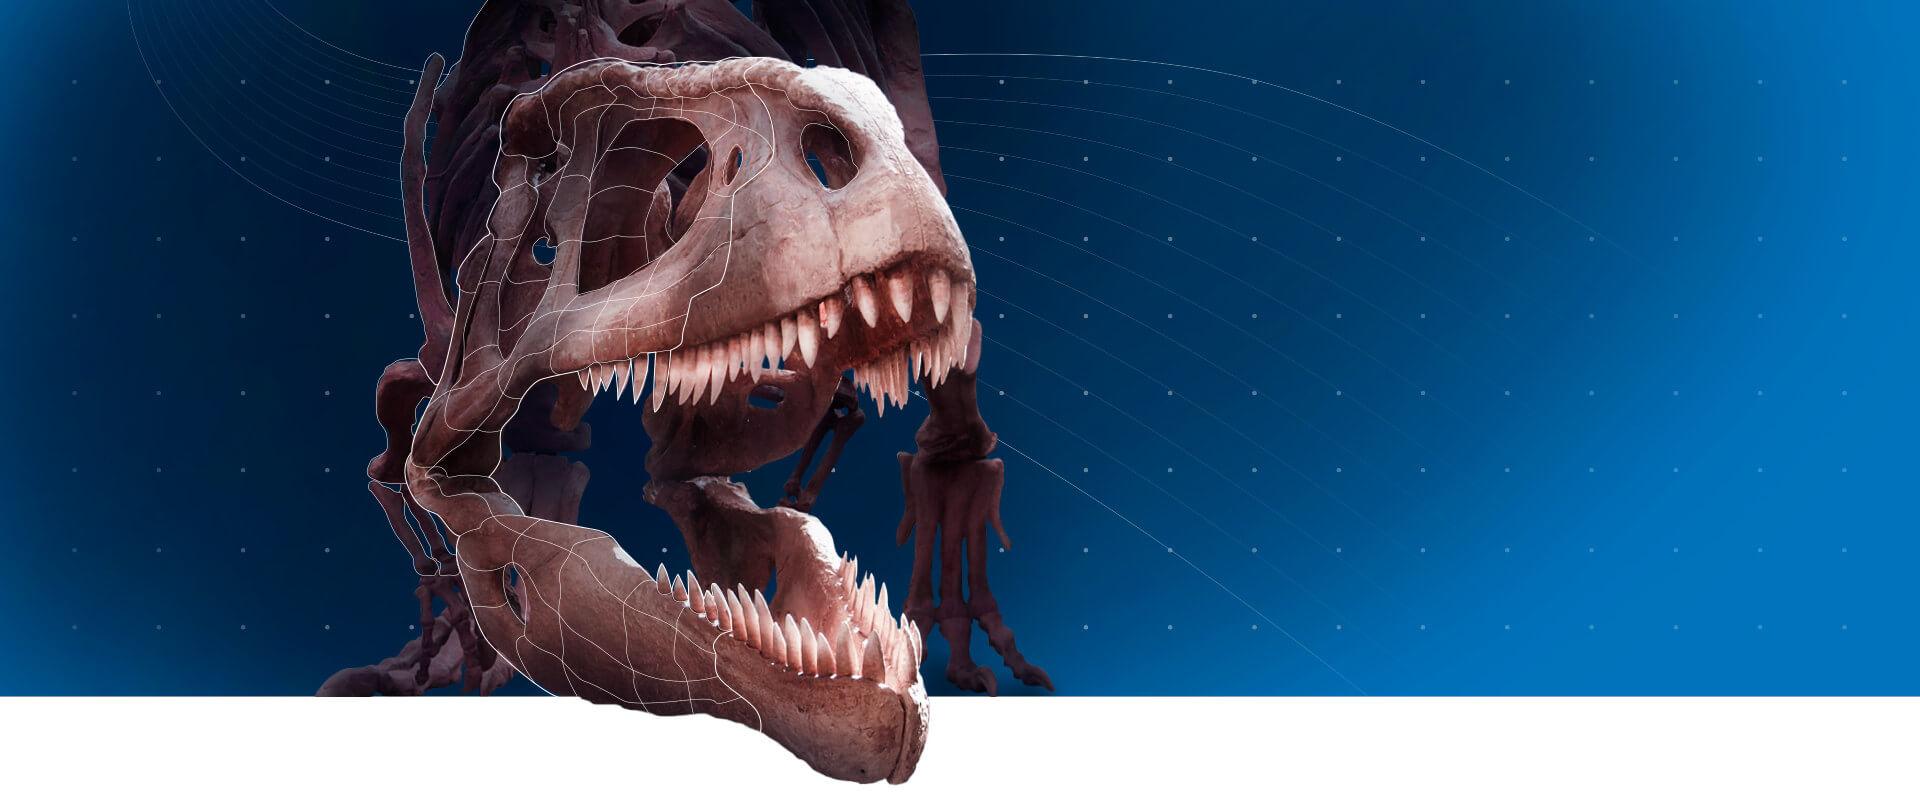 Featuring Tyrannotitan